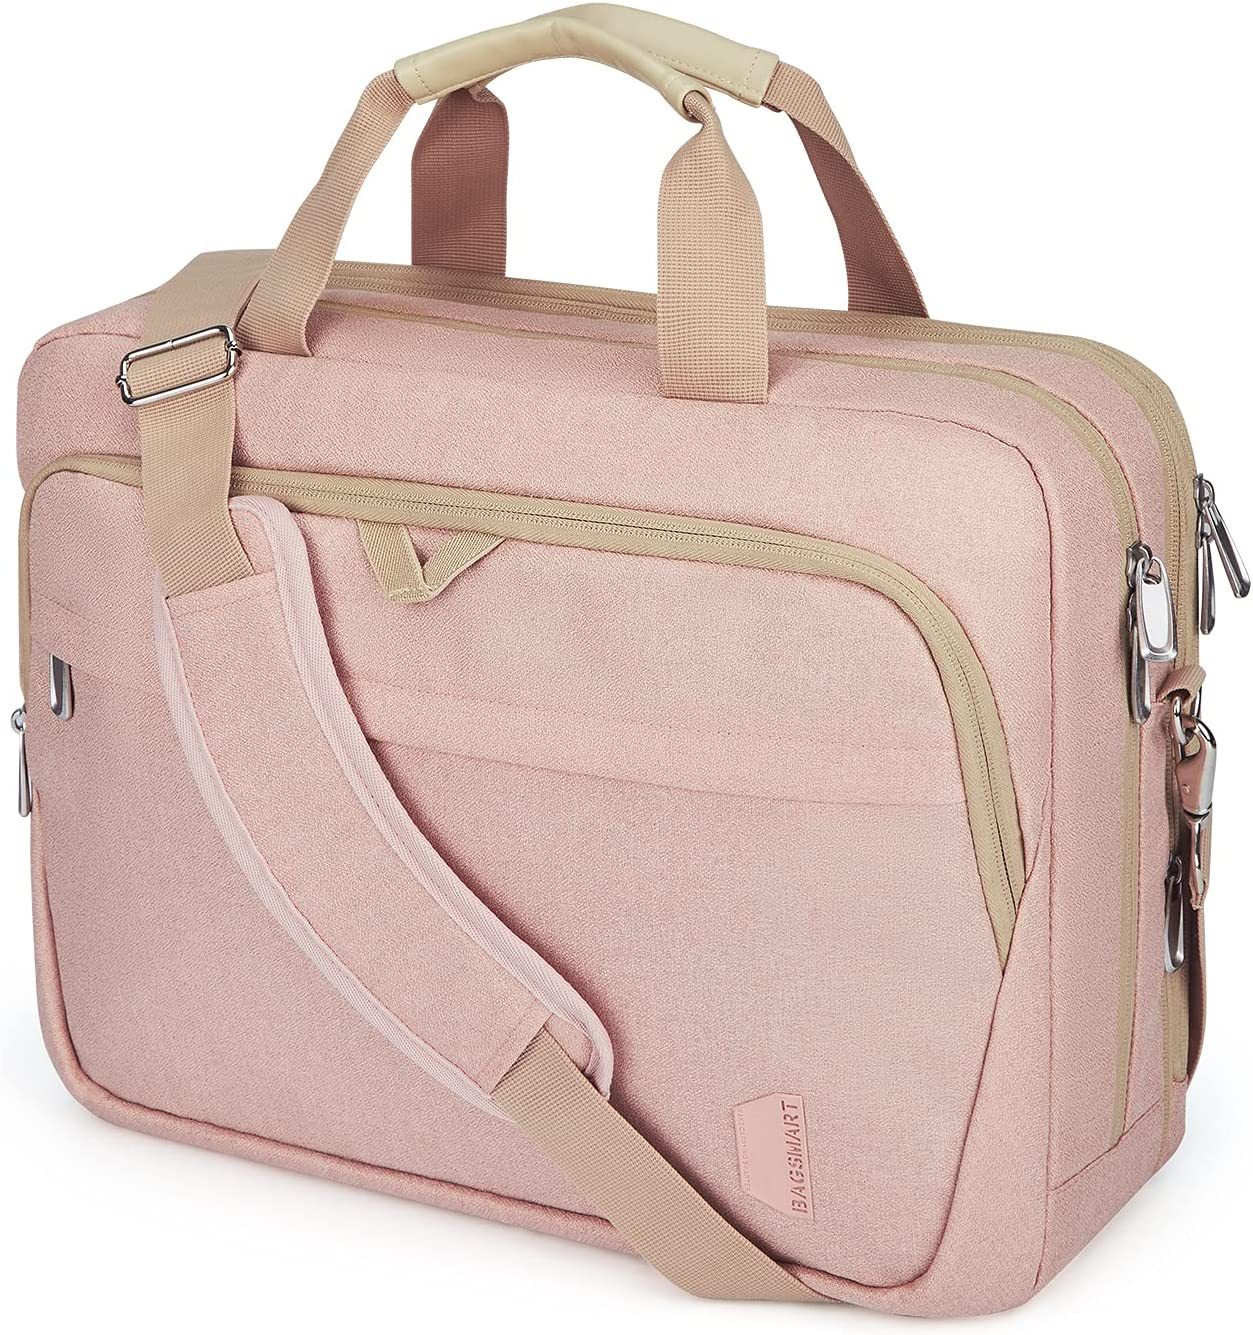 17.3 Inch Laptop Bag,BAGSMART Large Expandable Briefcase for Women Business Office Travel Computer Bag Shoulder Bag Water Resistant Anti Theft Durable,Pink